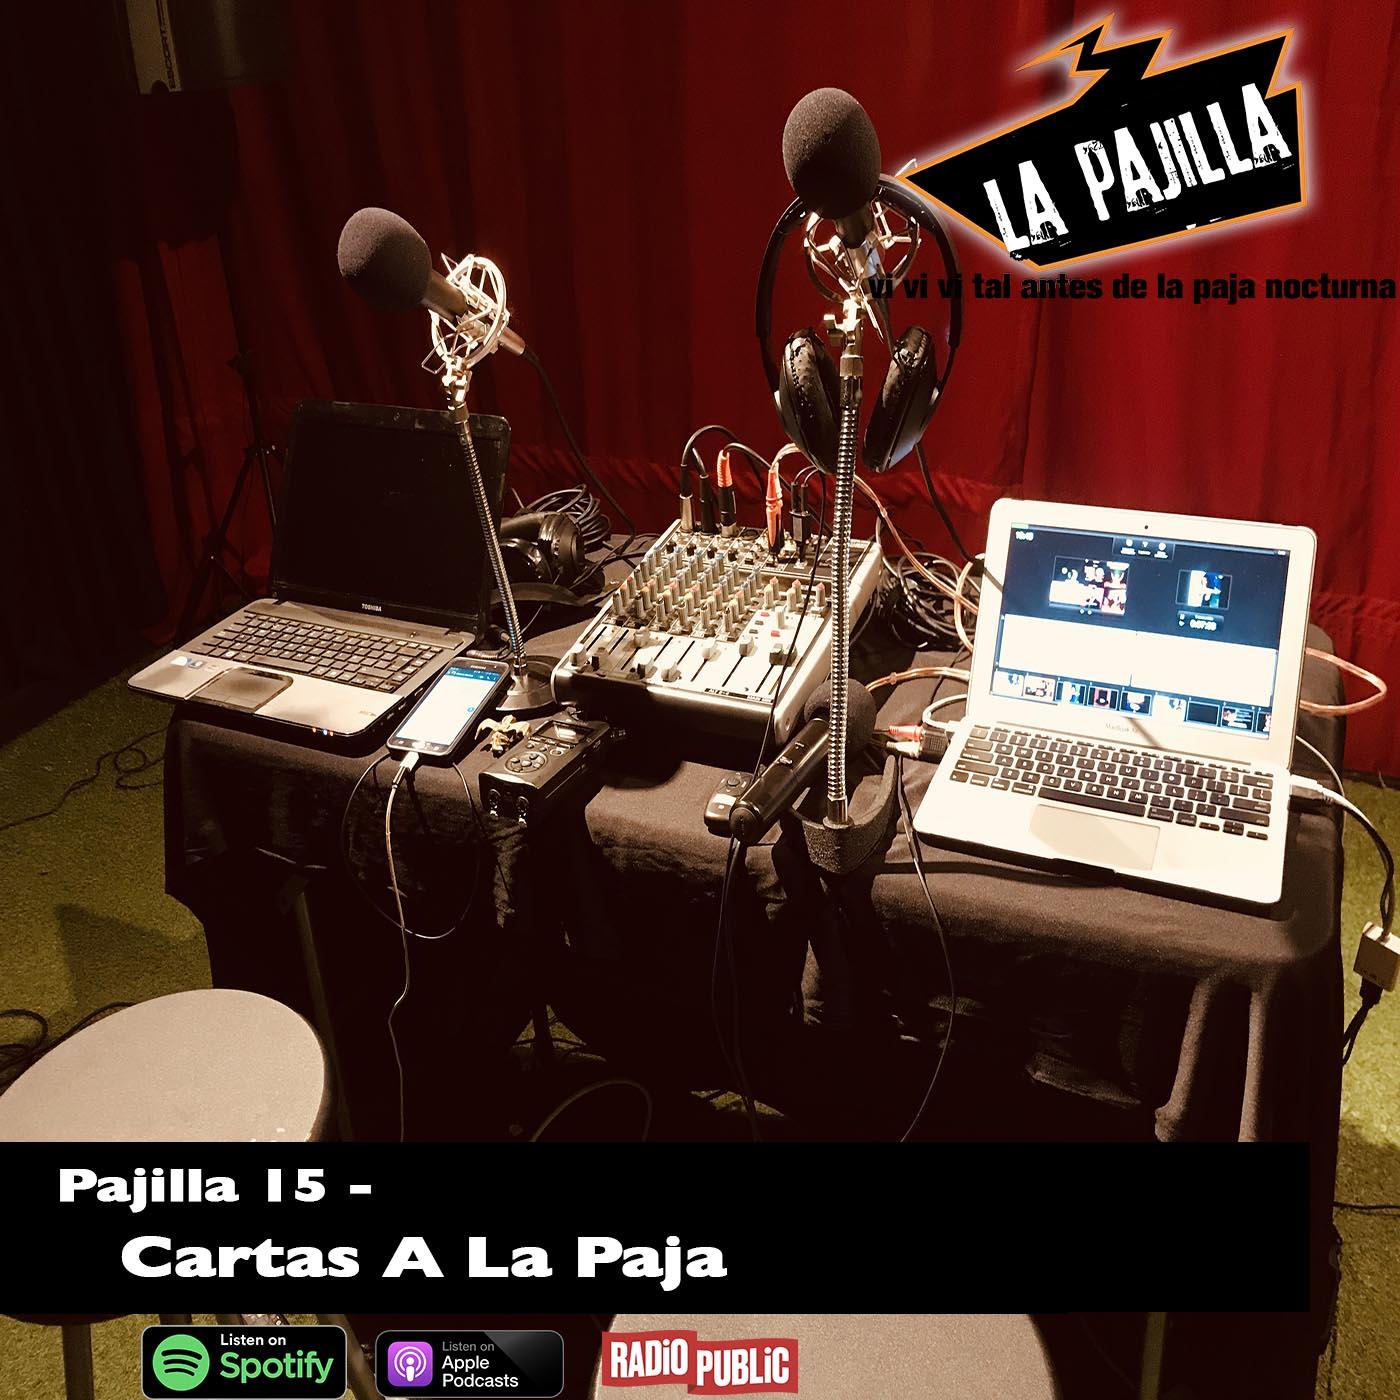 La Paja Nocturna Podcast Spotify